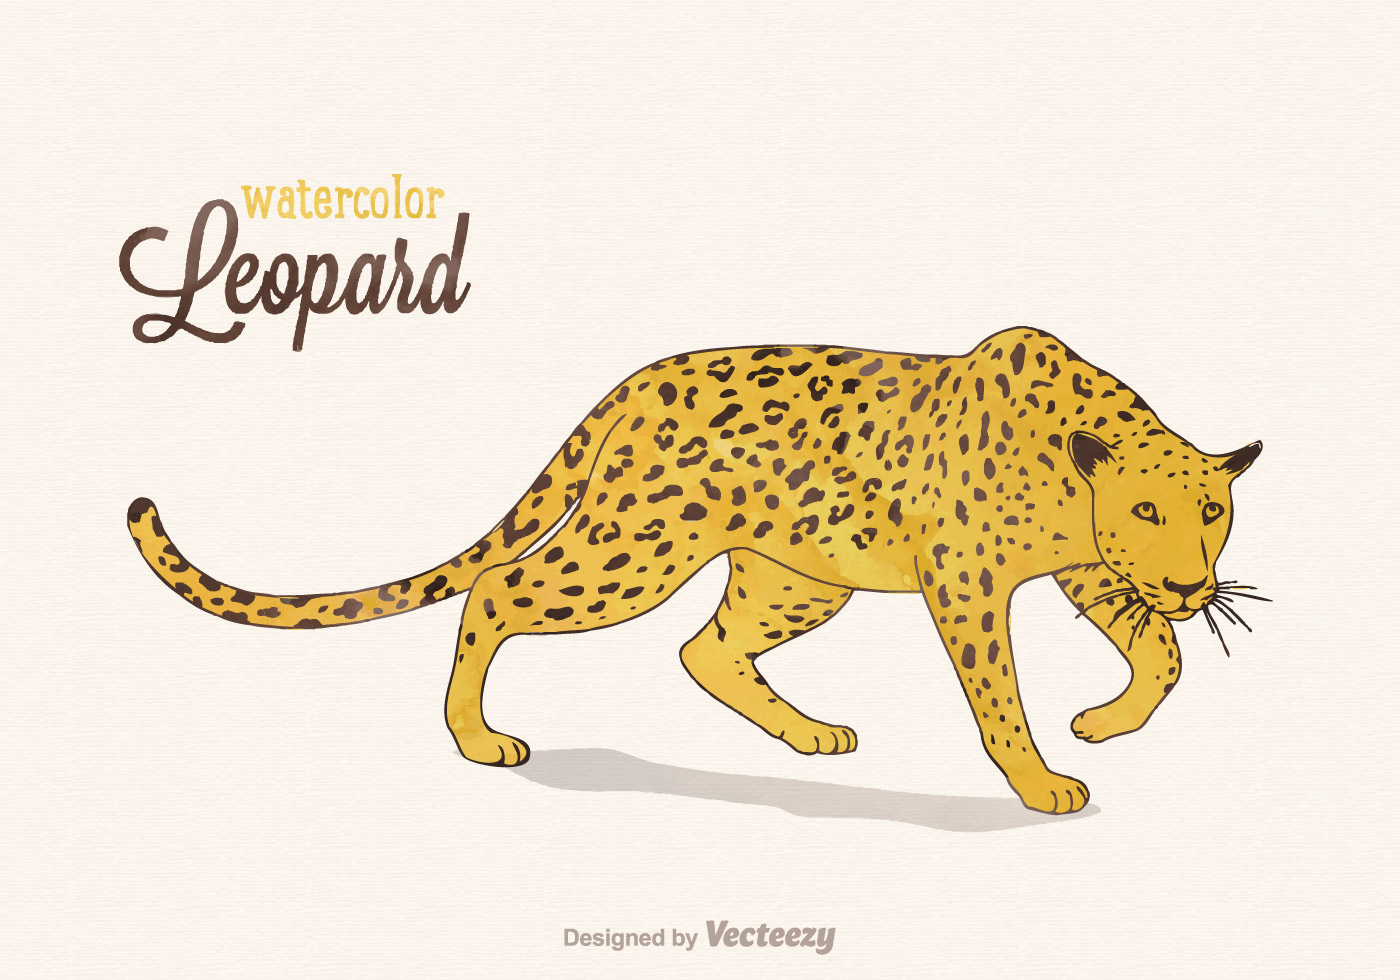 free vector watercolor leopard illustration download jaguar logo vector 2017 jaguar land rover logo vector